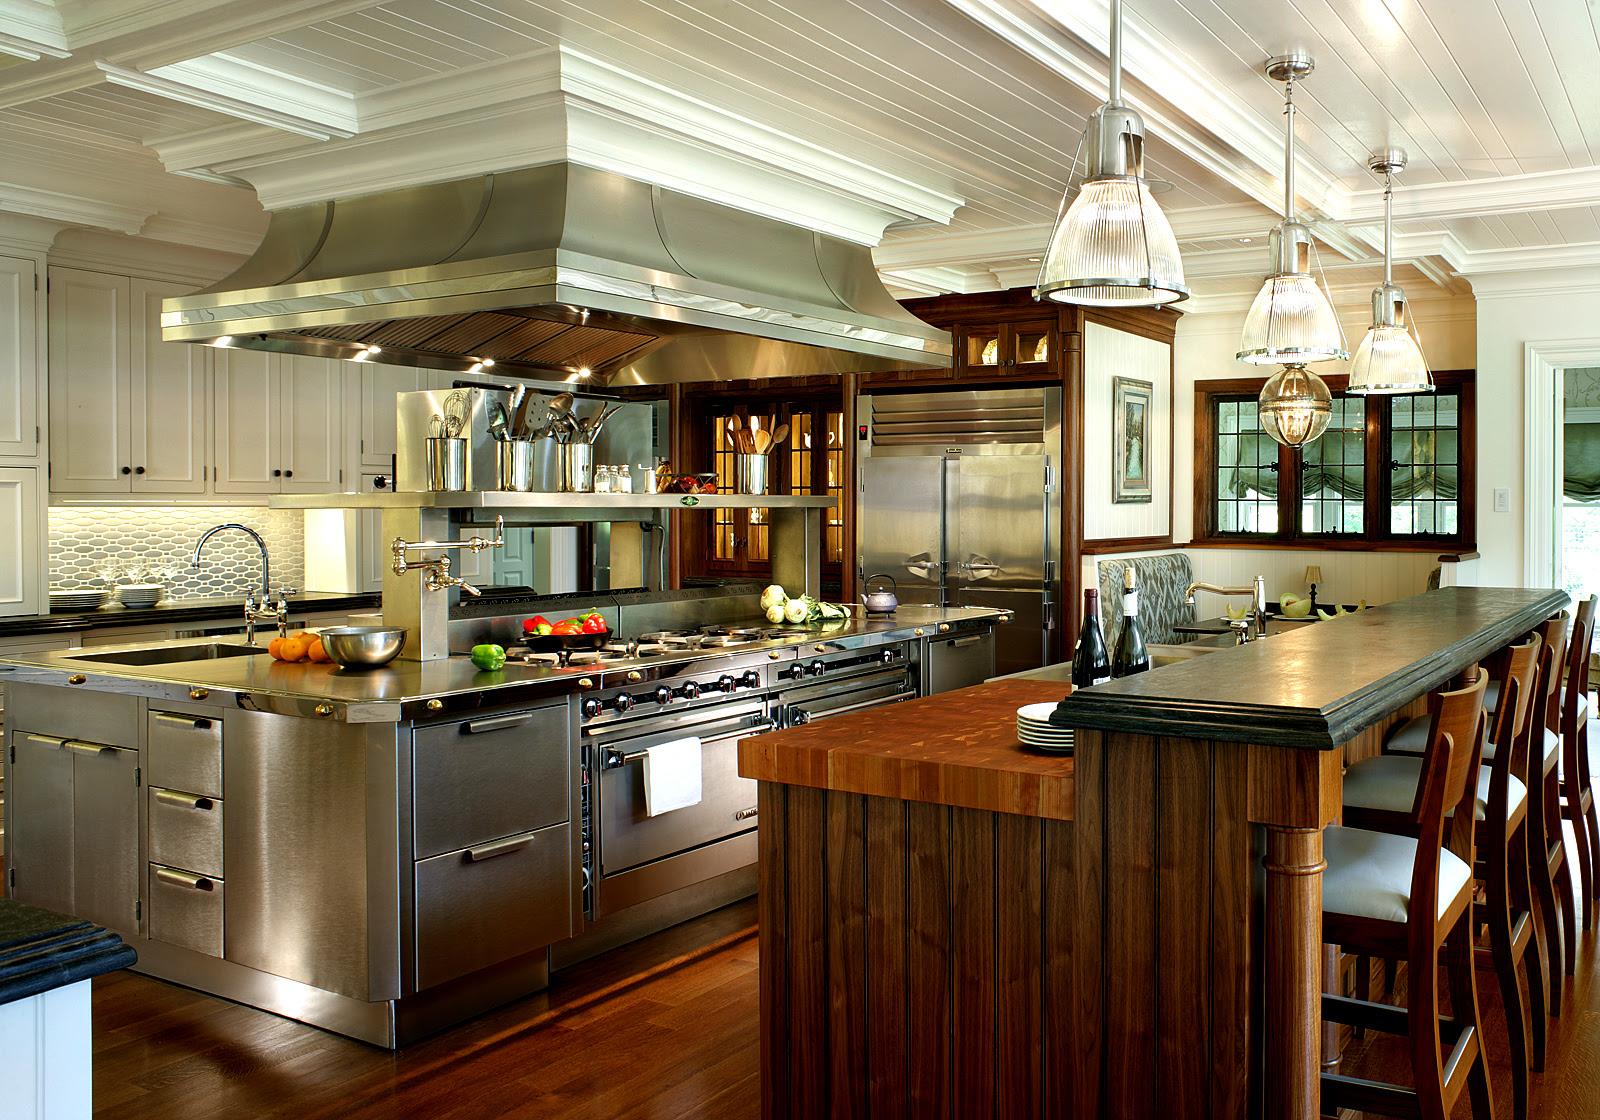 Award-Winning Kitchen Design Available to International ...